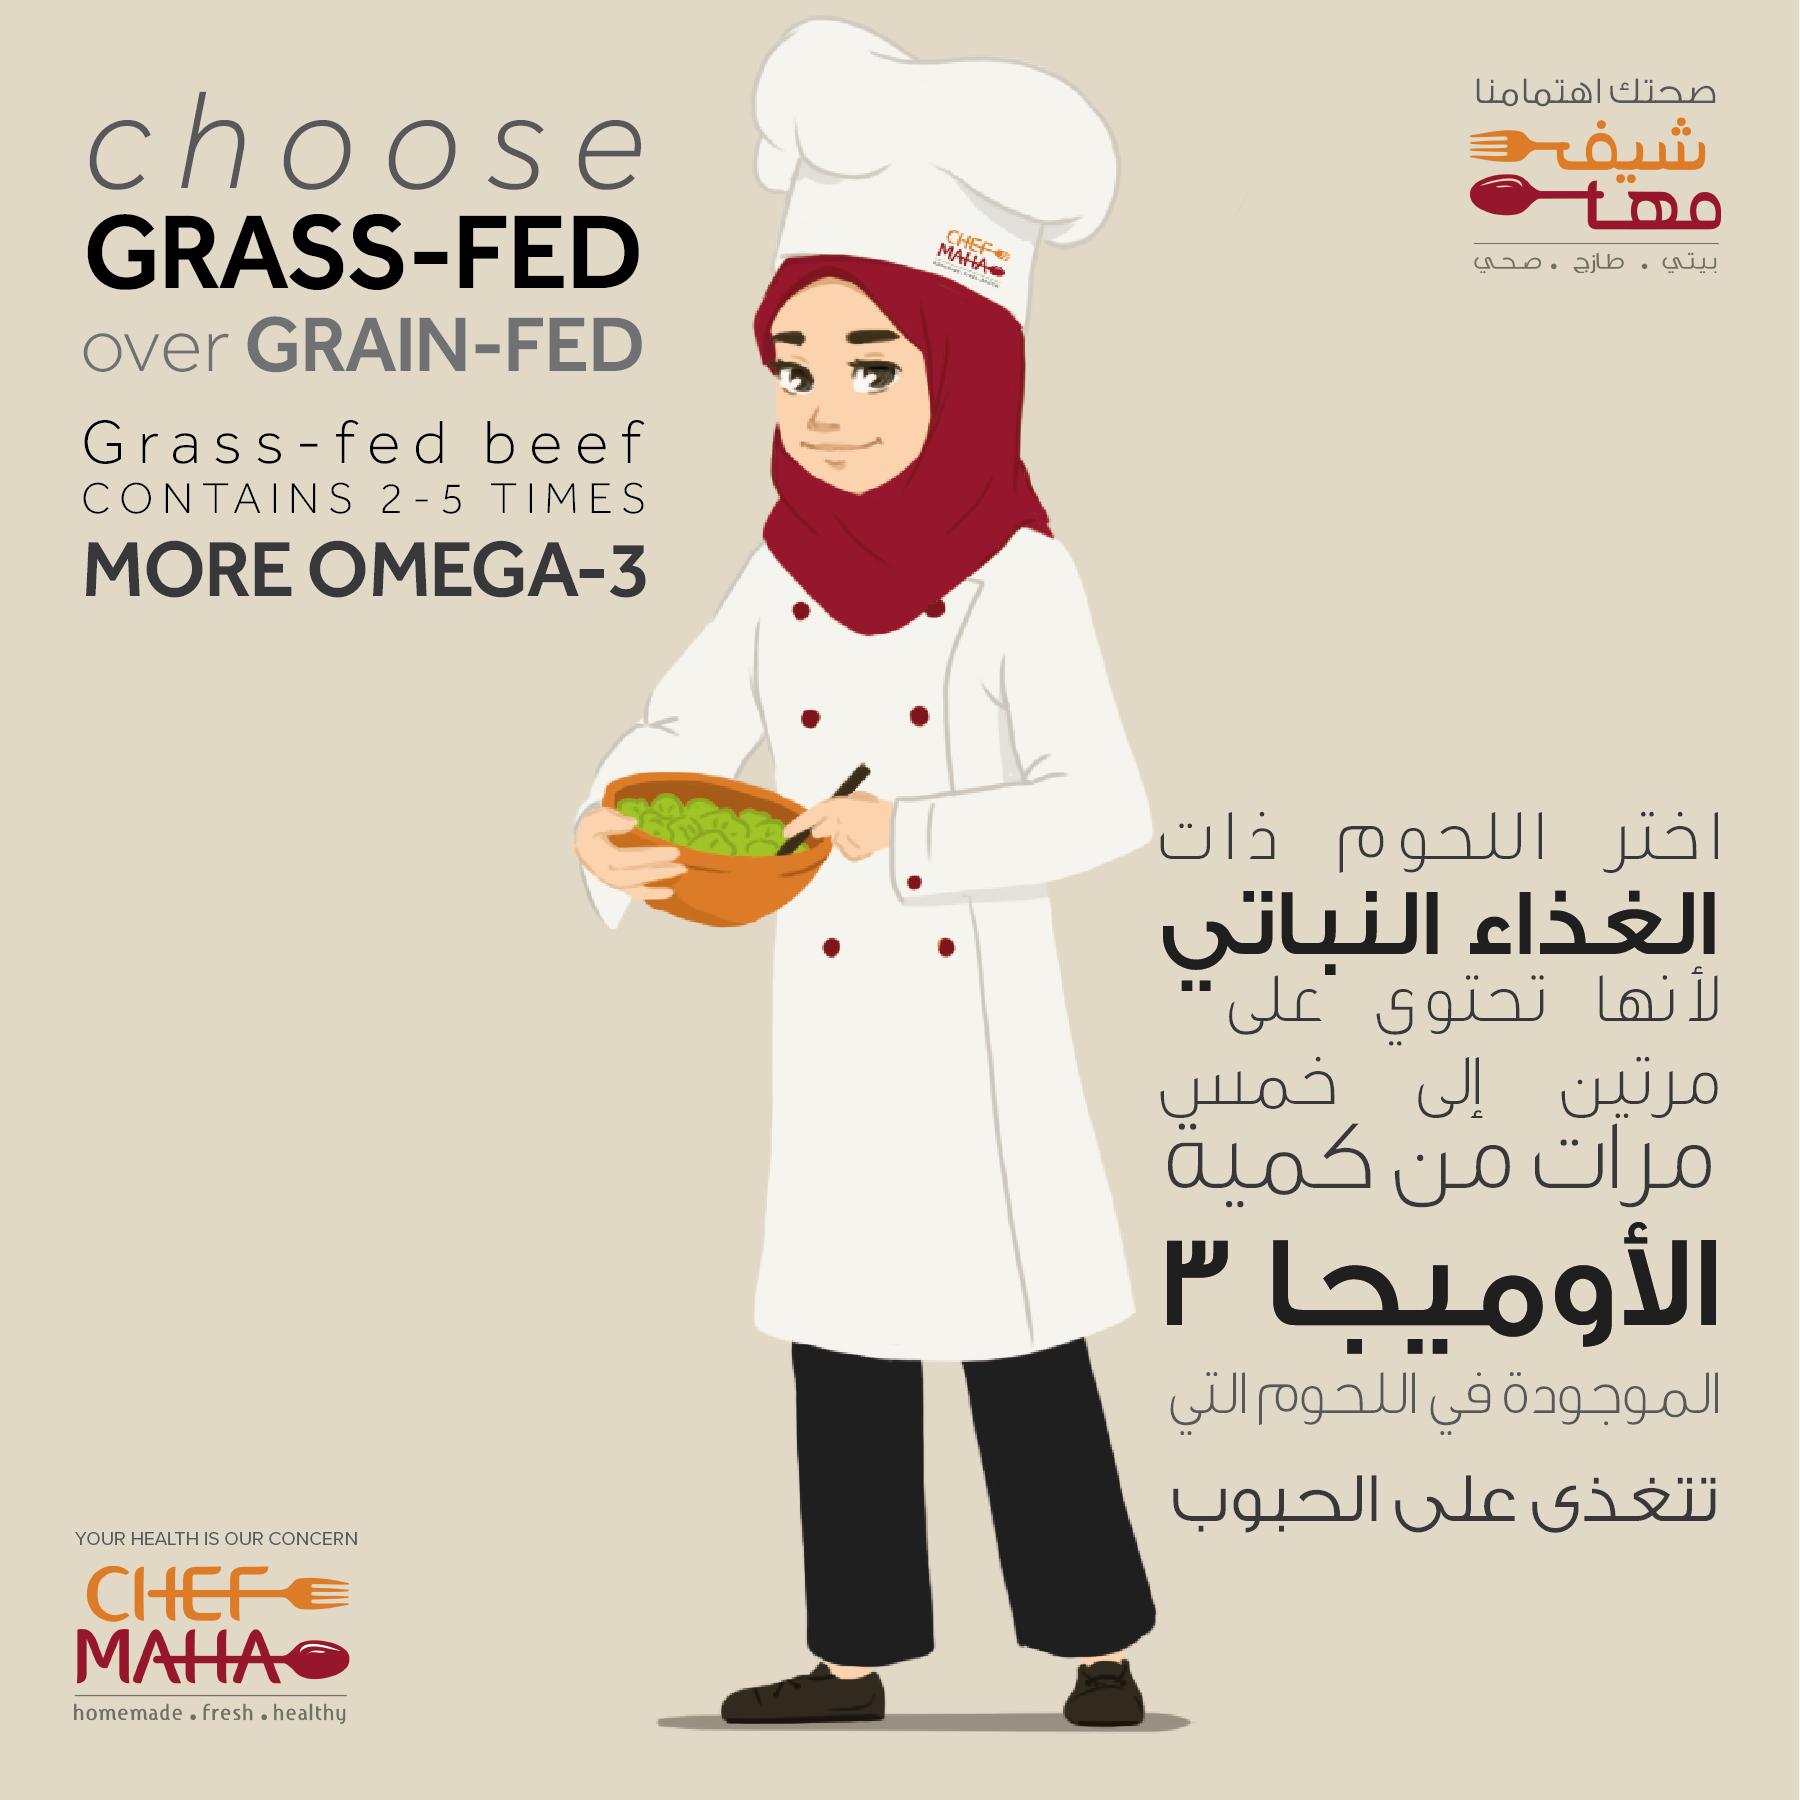 Choose #GrassFed products & #GrassFedBeef to increase your #Omega3 intake.  #Riyadhizens #Riyadh #SaudiArabia #HealthAddicts #YouAreWhatYouEat #BeGoodToYourself #TakeCareOfYourBody #HealthIsWealth